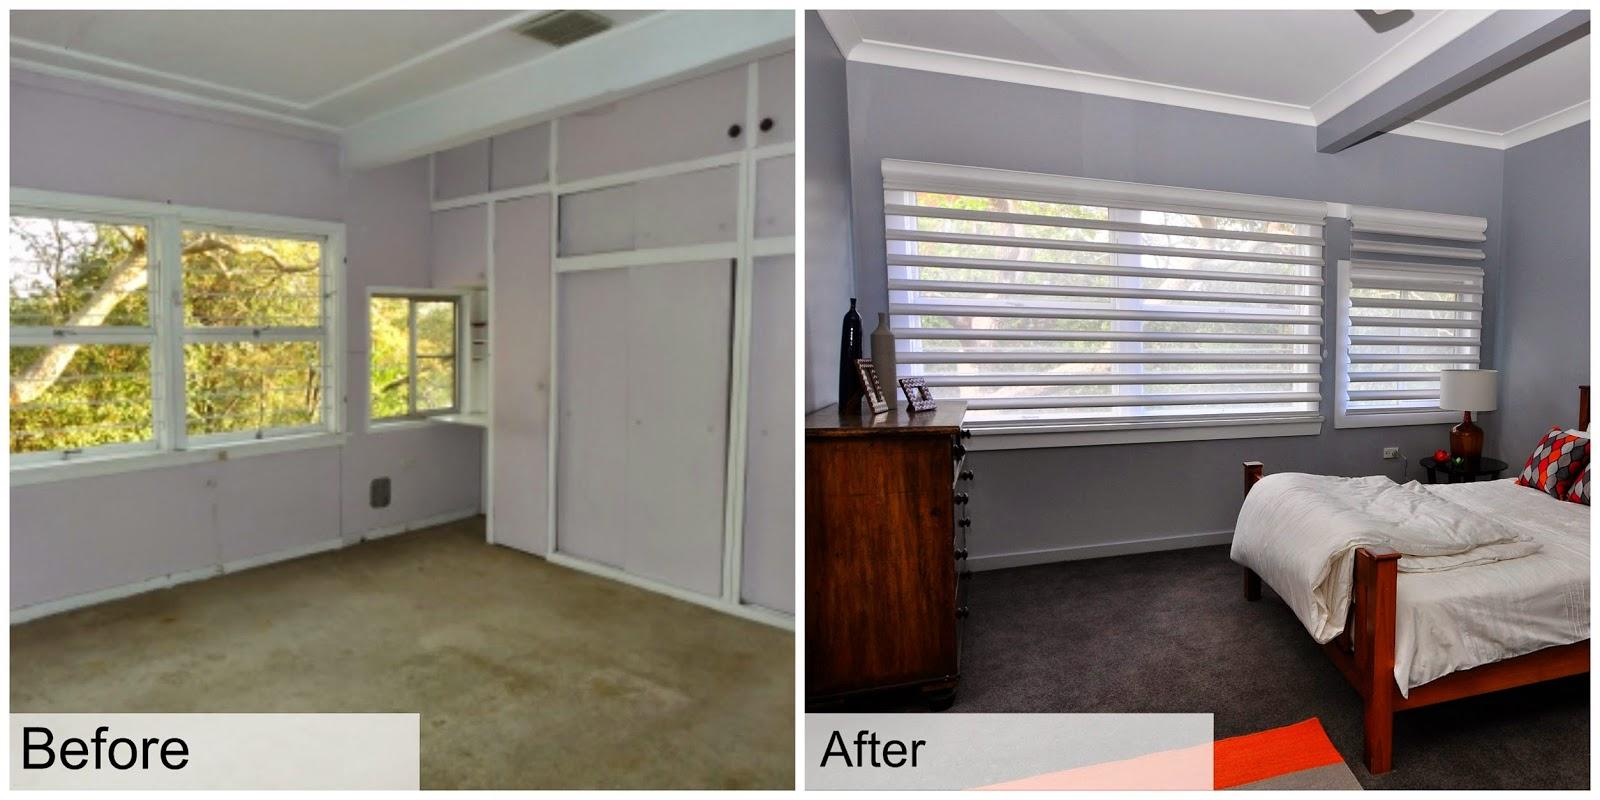 exterior home renovations before and after australia australian selling houses australia interior designer house design